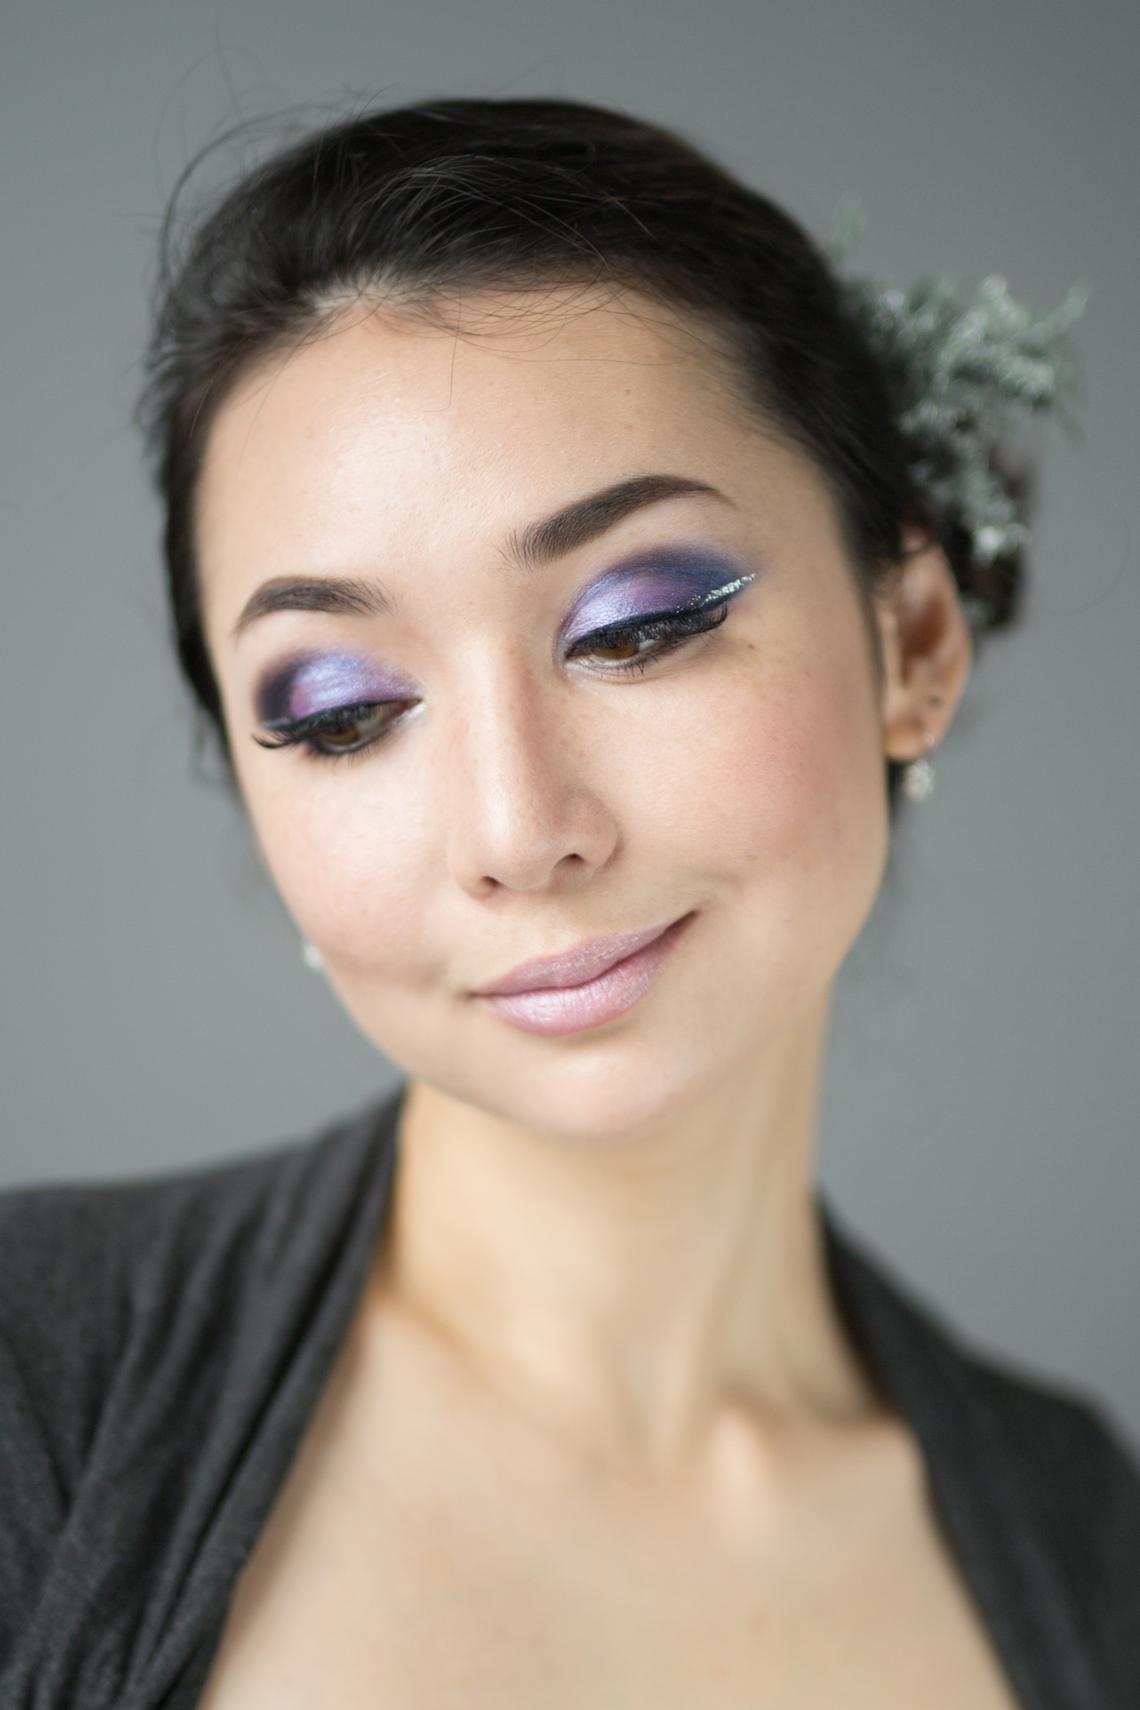 singaporebeautyblog_emilyloke_purpleandsilver_makeup2